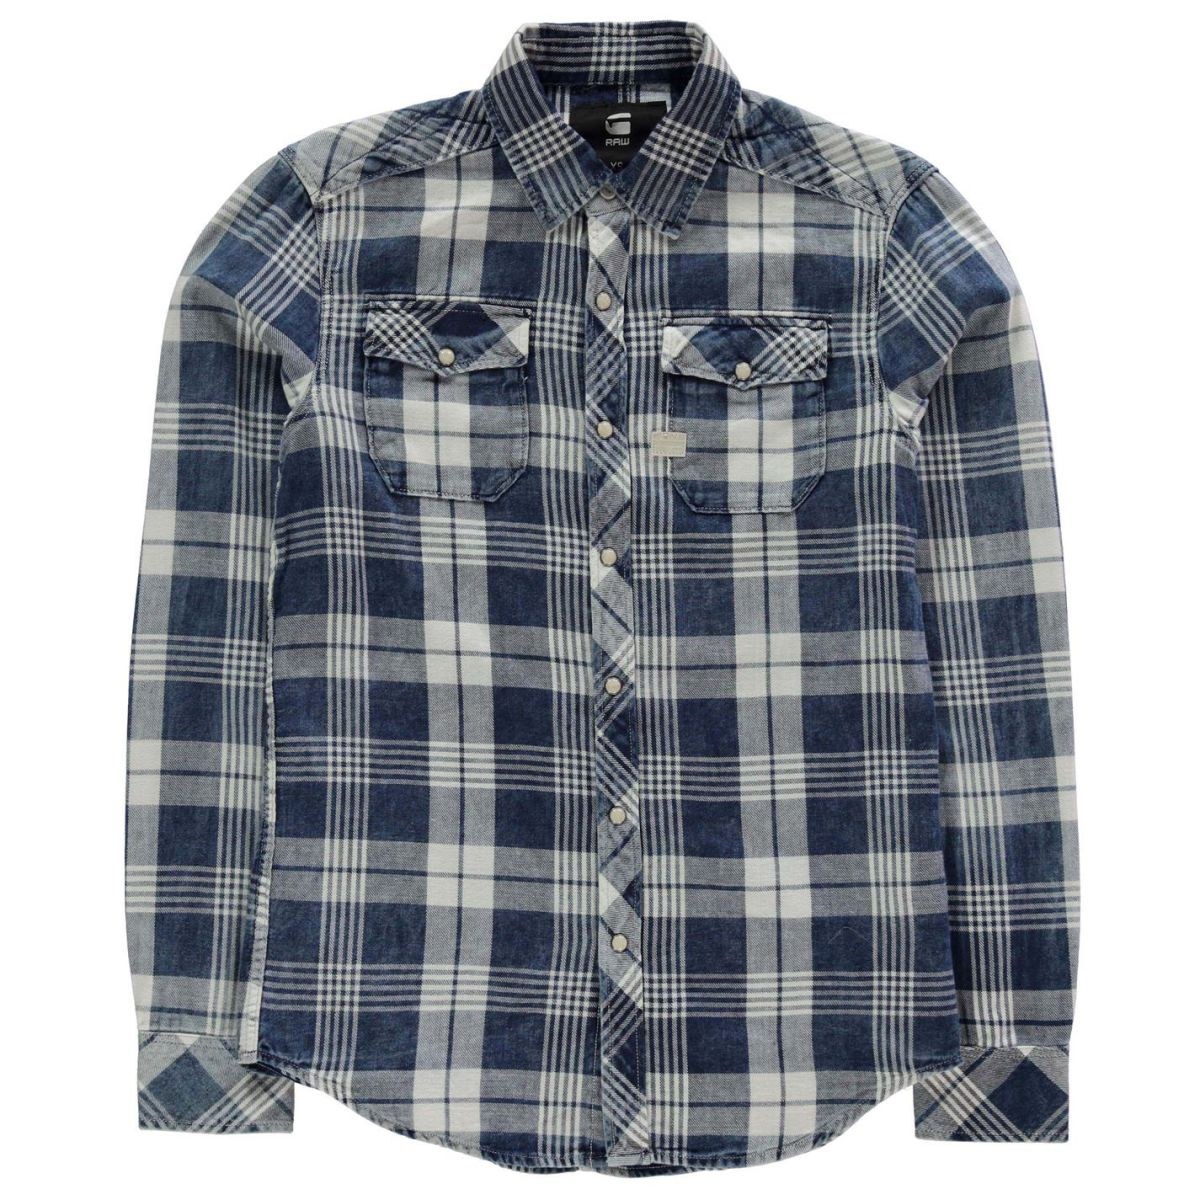 890d9a5ce7 Details about G Star Mens Landoh Shirt Long Sleeve Casual Lightweight  Cotton Print All Over